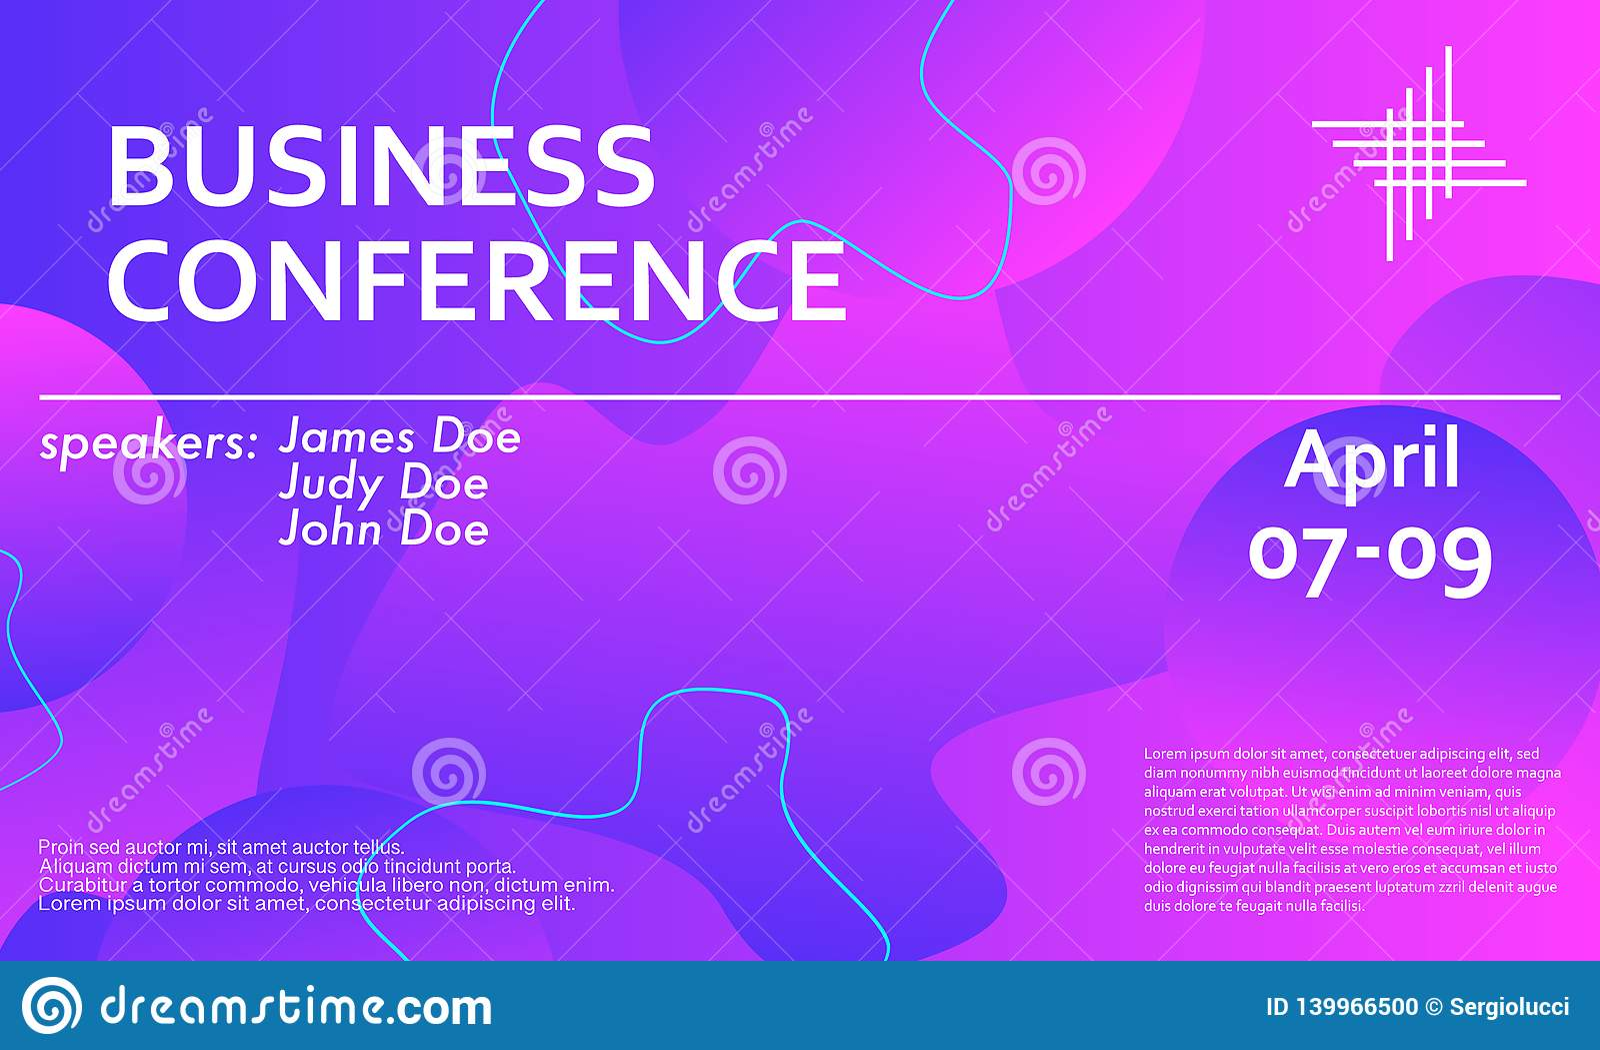 Business Conference Invitation Design Template Stock Vector